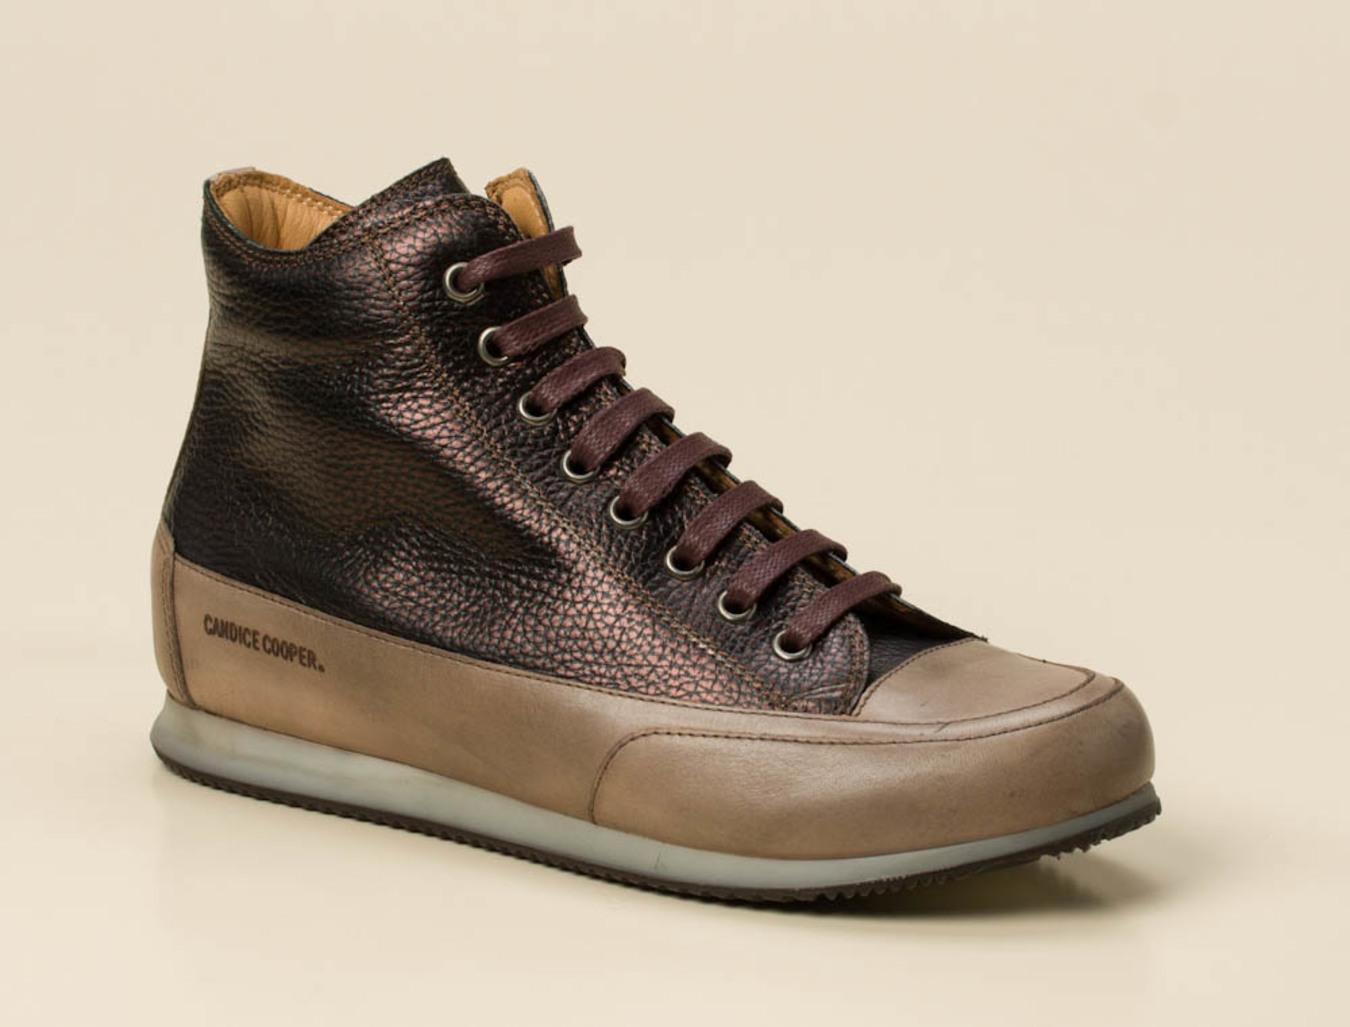 aaafcc4cf43be9 Candice Cooper Damen Sneaker high in braun kaufen